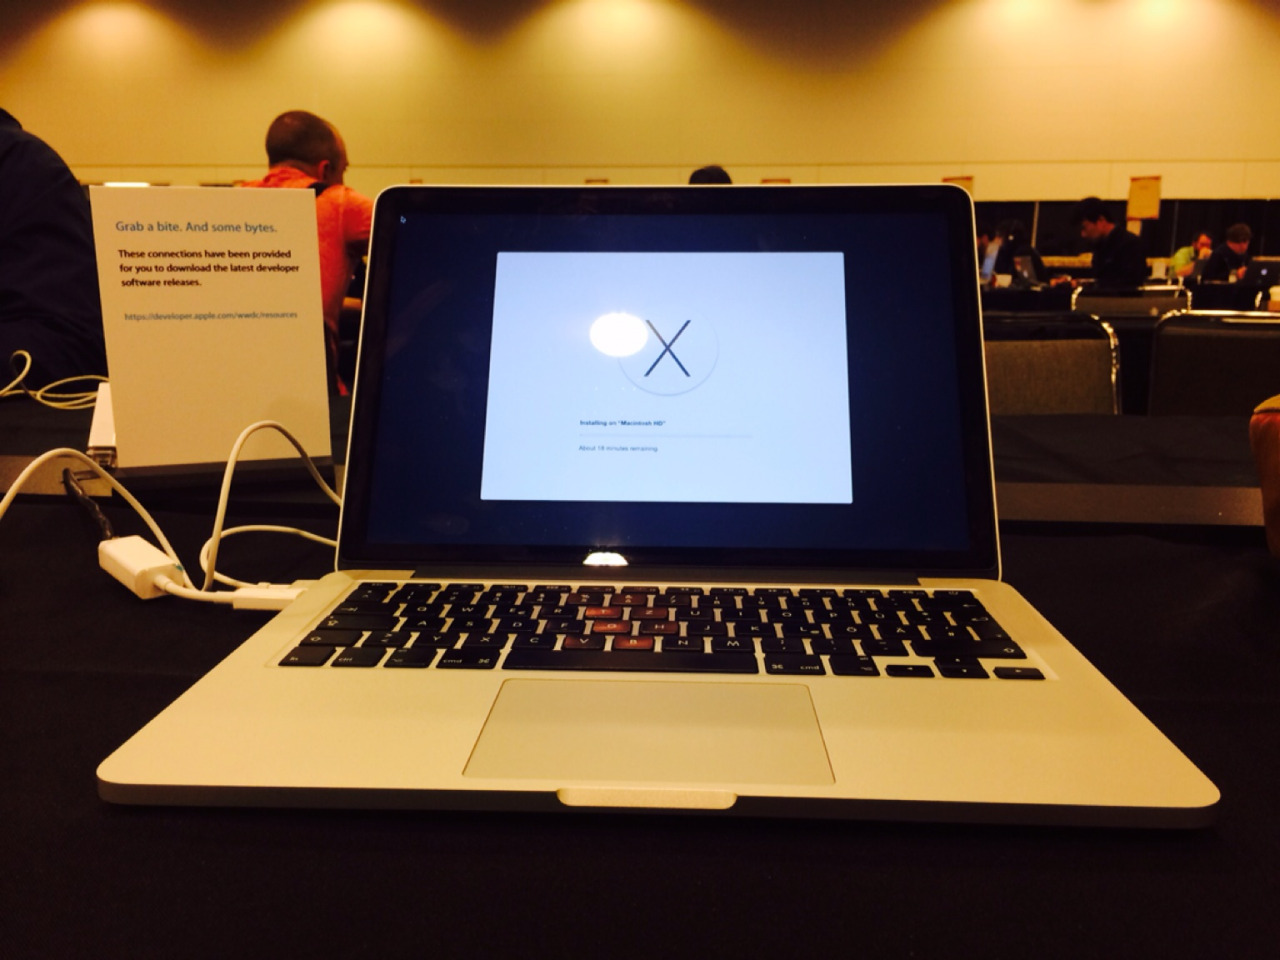 WWDC 2014 - installing Yosemite